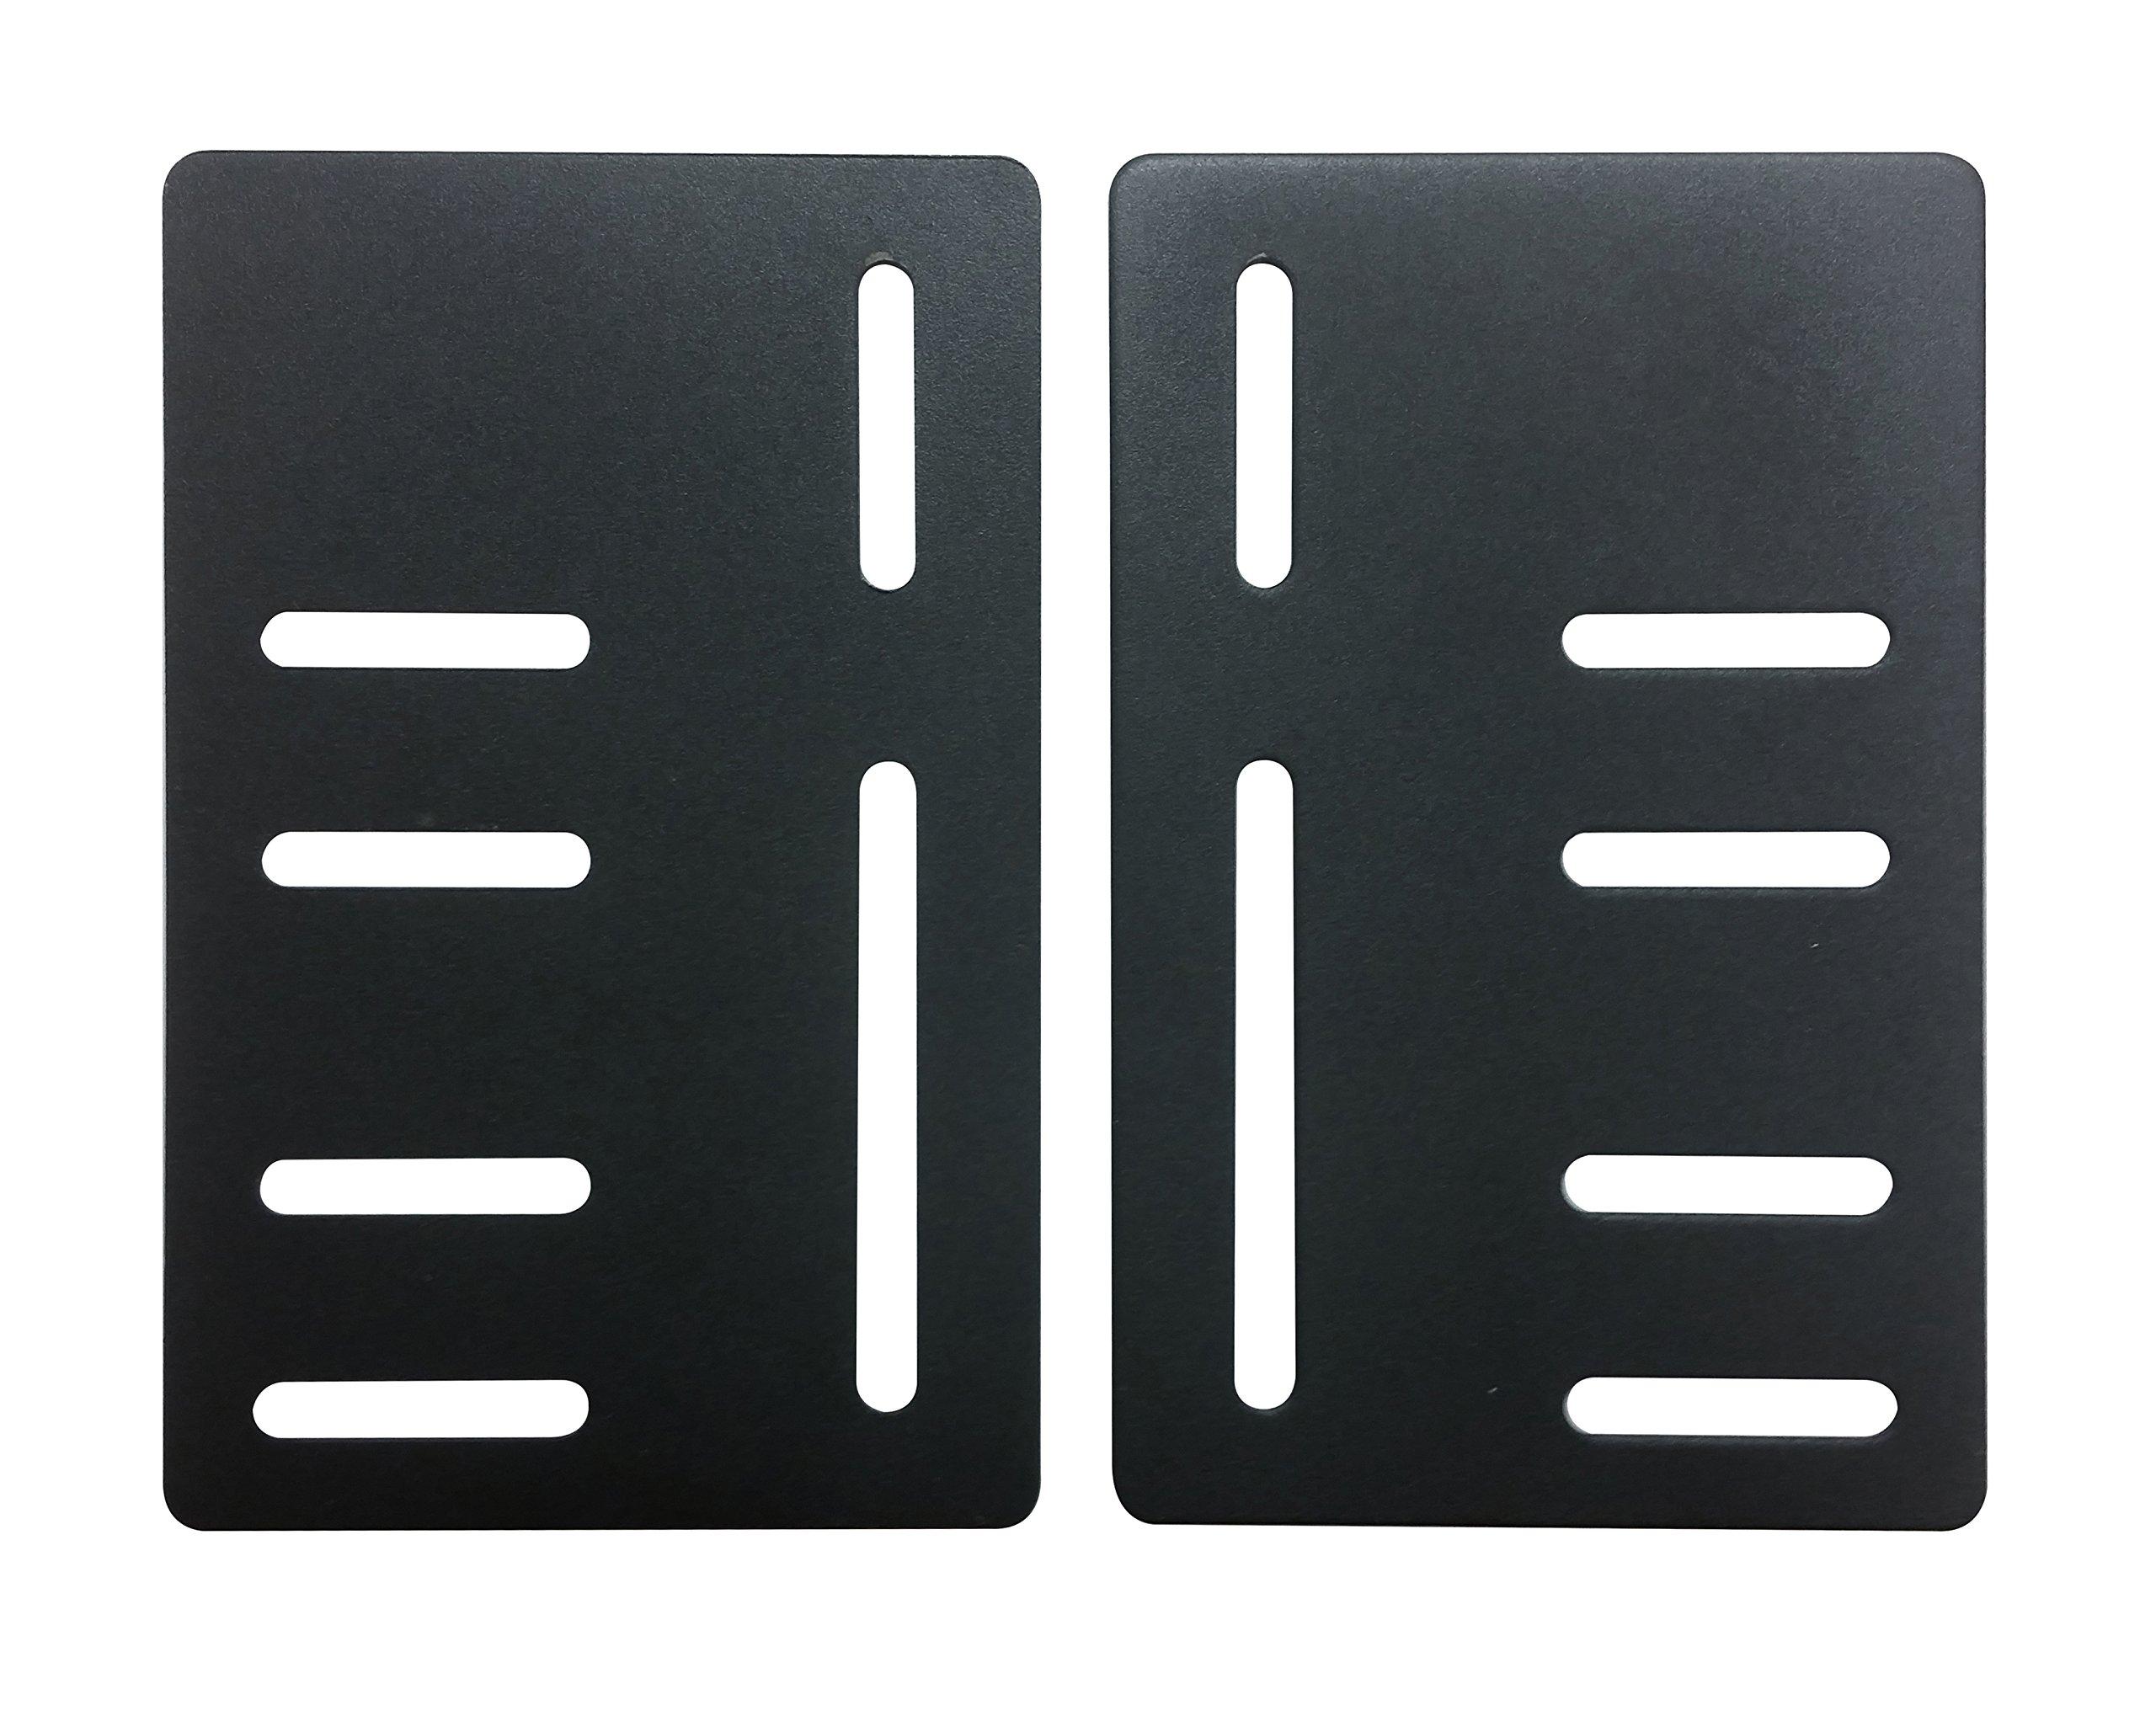 Kings Brand Bed Frame Headboard Bracket Modification Modi-Plate ~Set of 2 Plates~ by Kings Brand Furniture (Image #1)